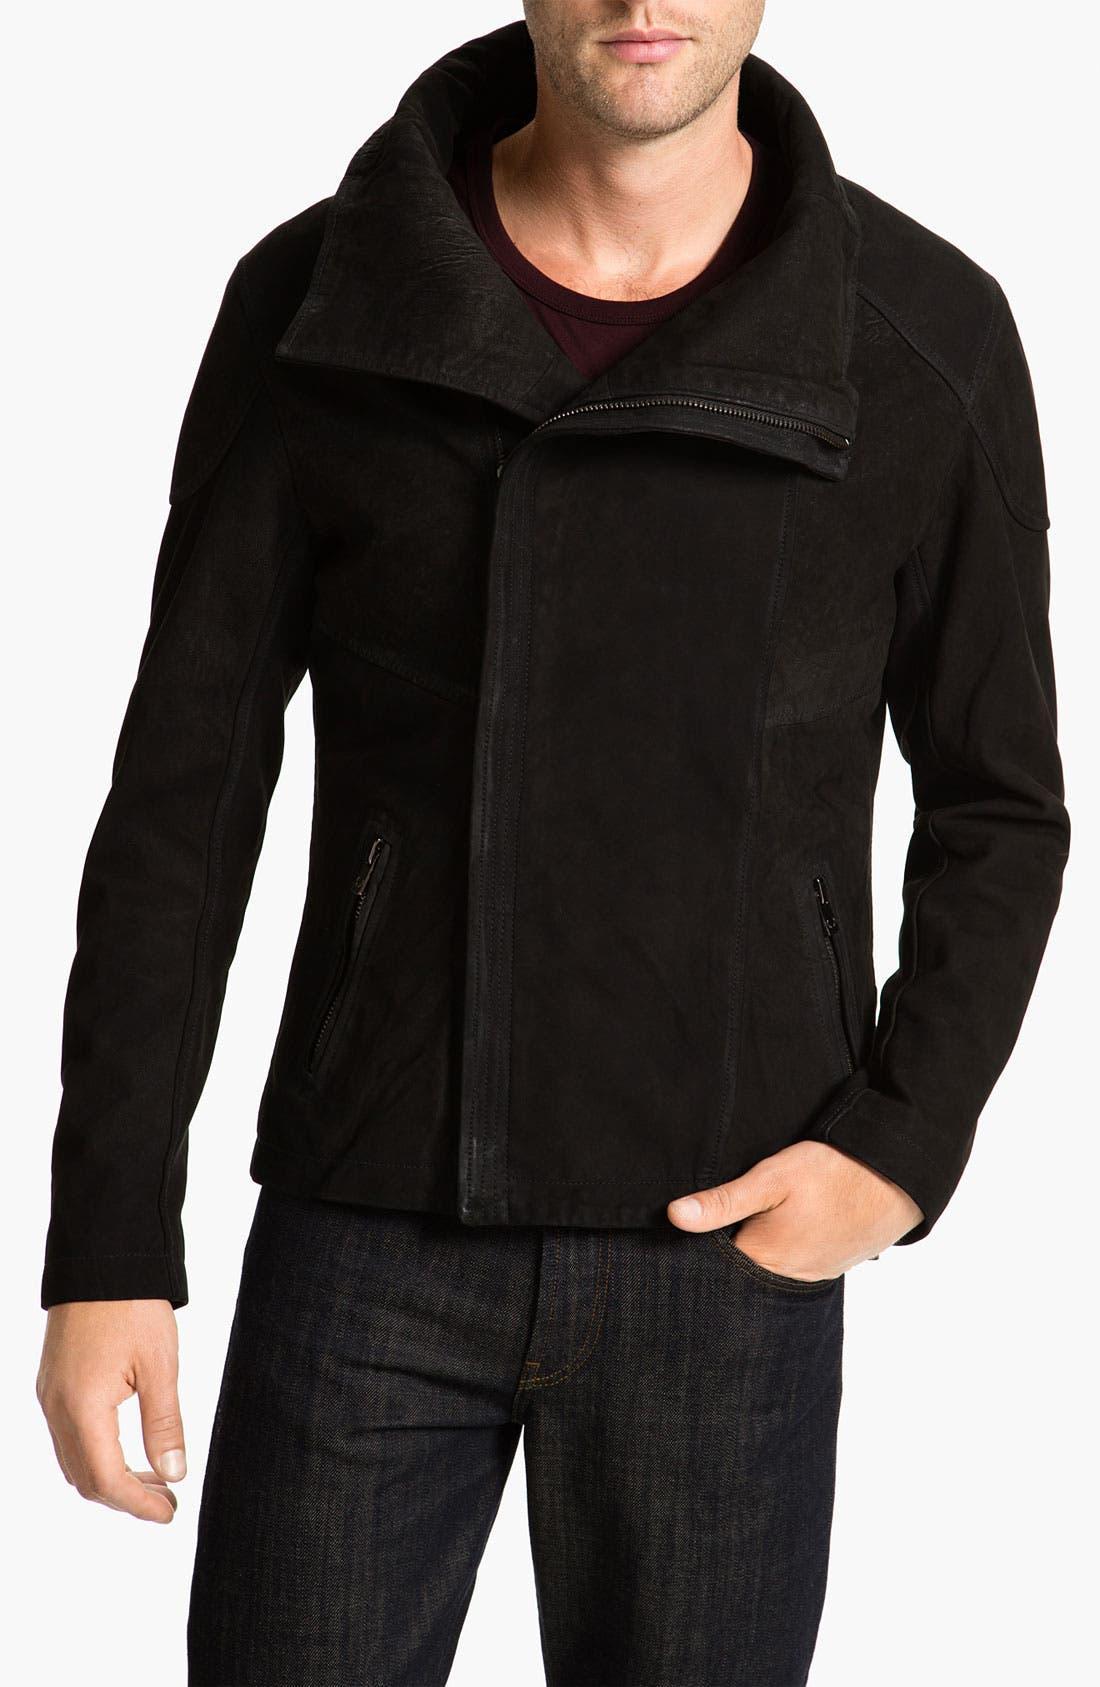 Main Image - Bod & Christensen Nubuck Jacket